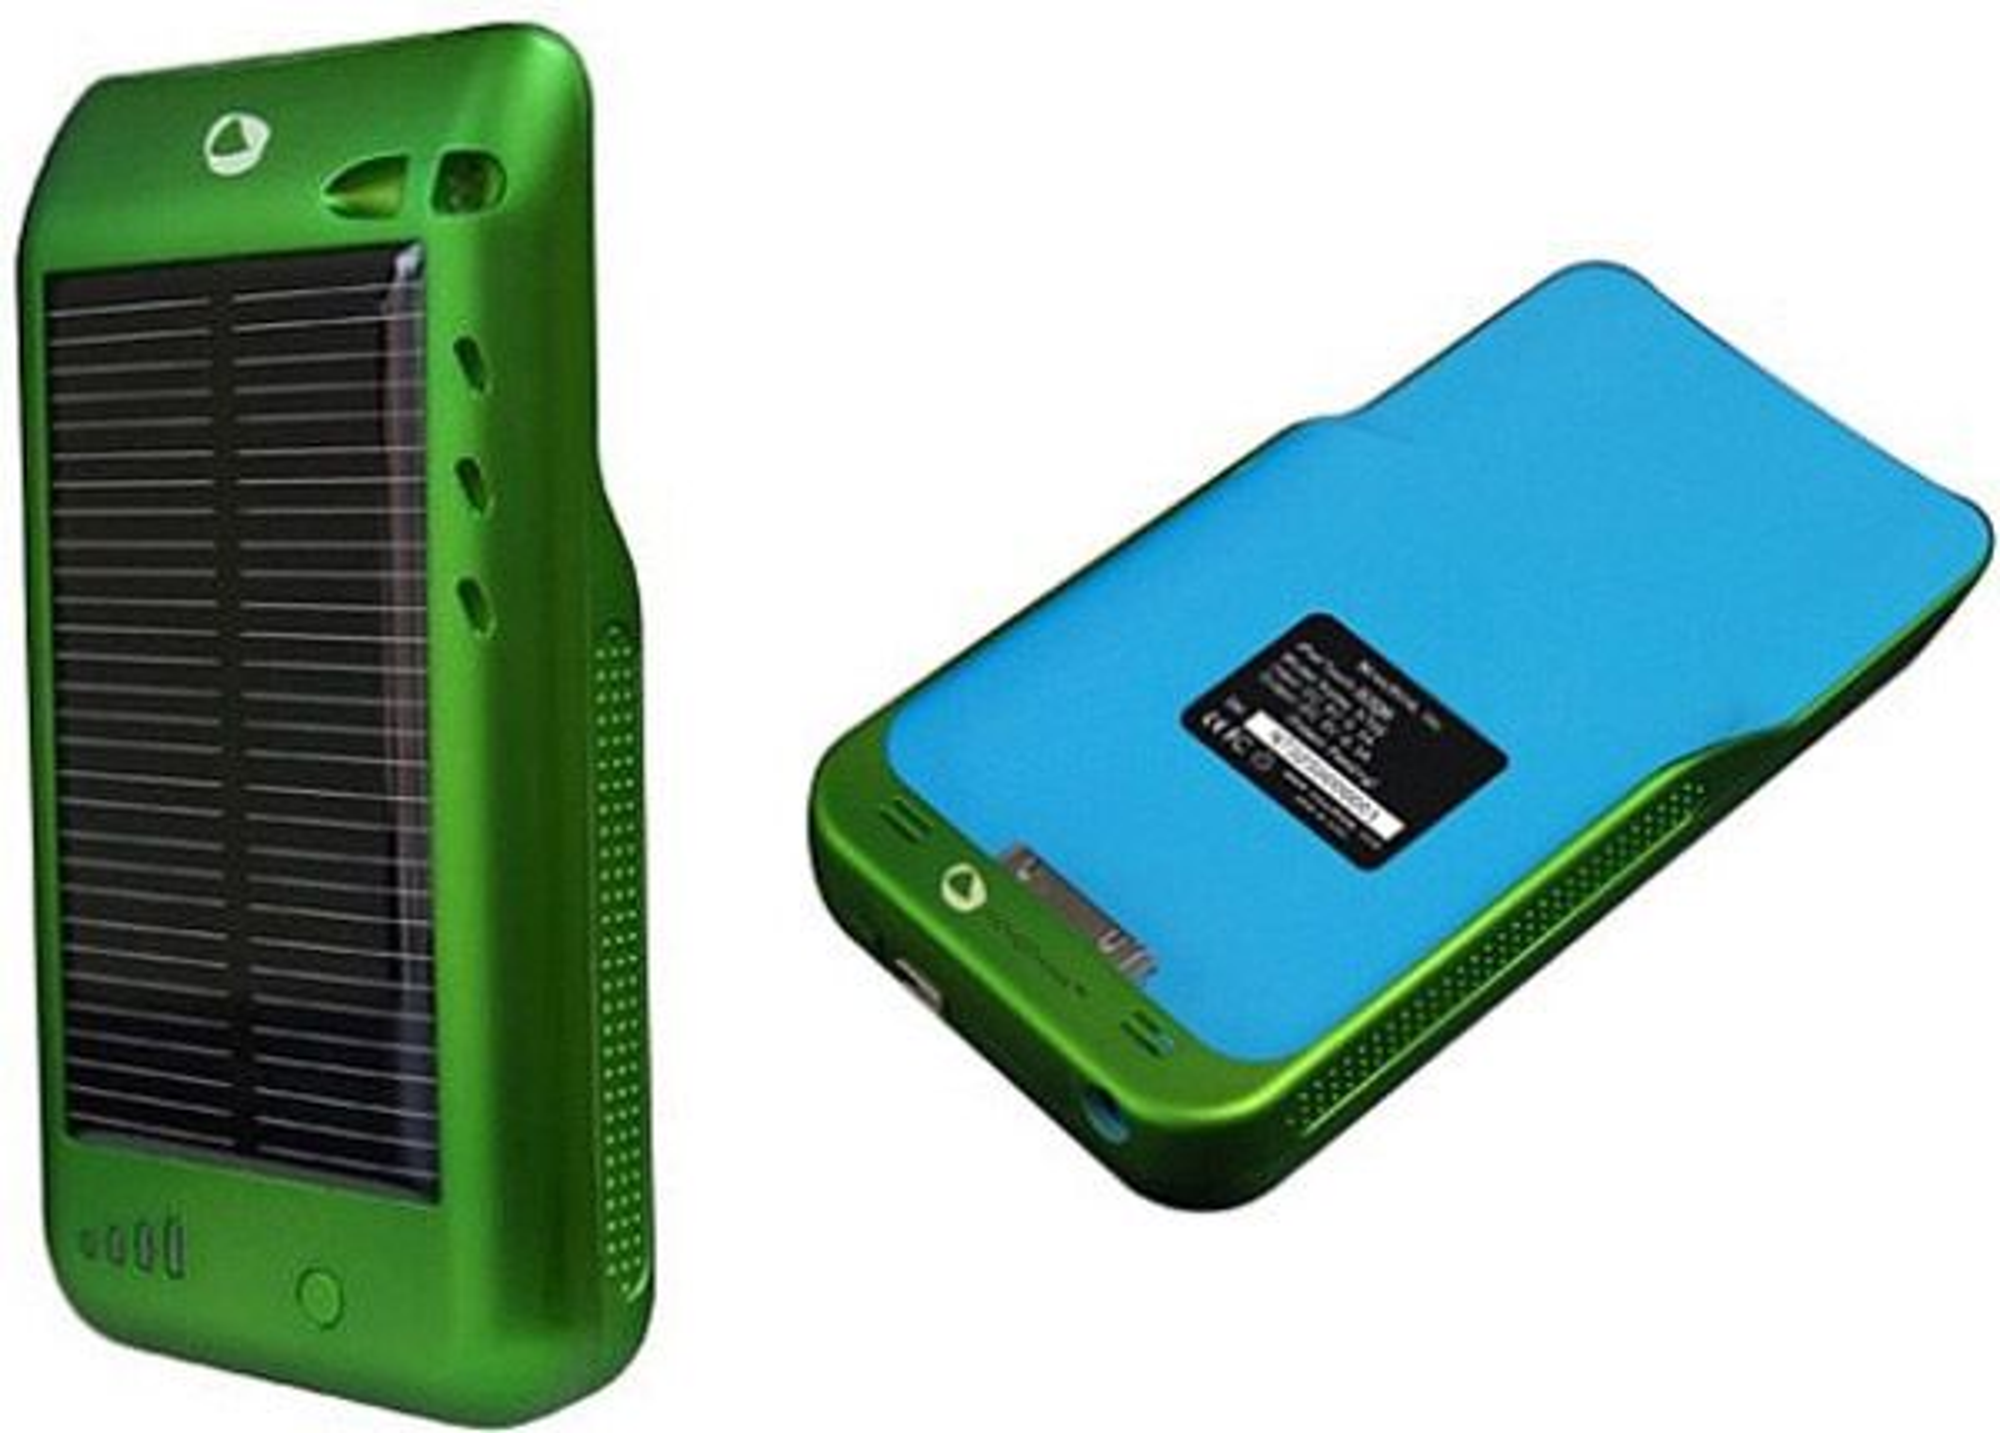 Novothink Surge lader din iPhone mens du slapper av i skyggen.